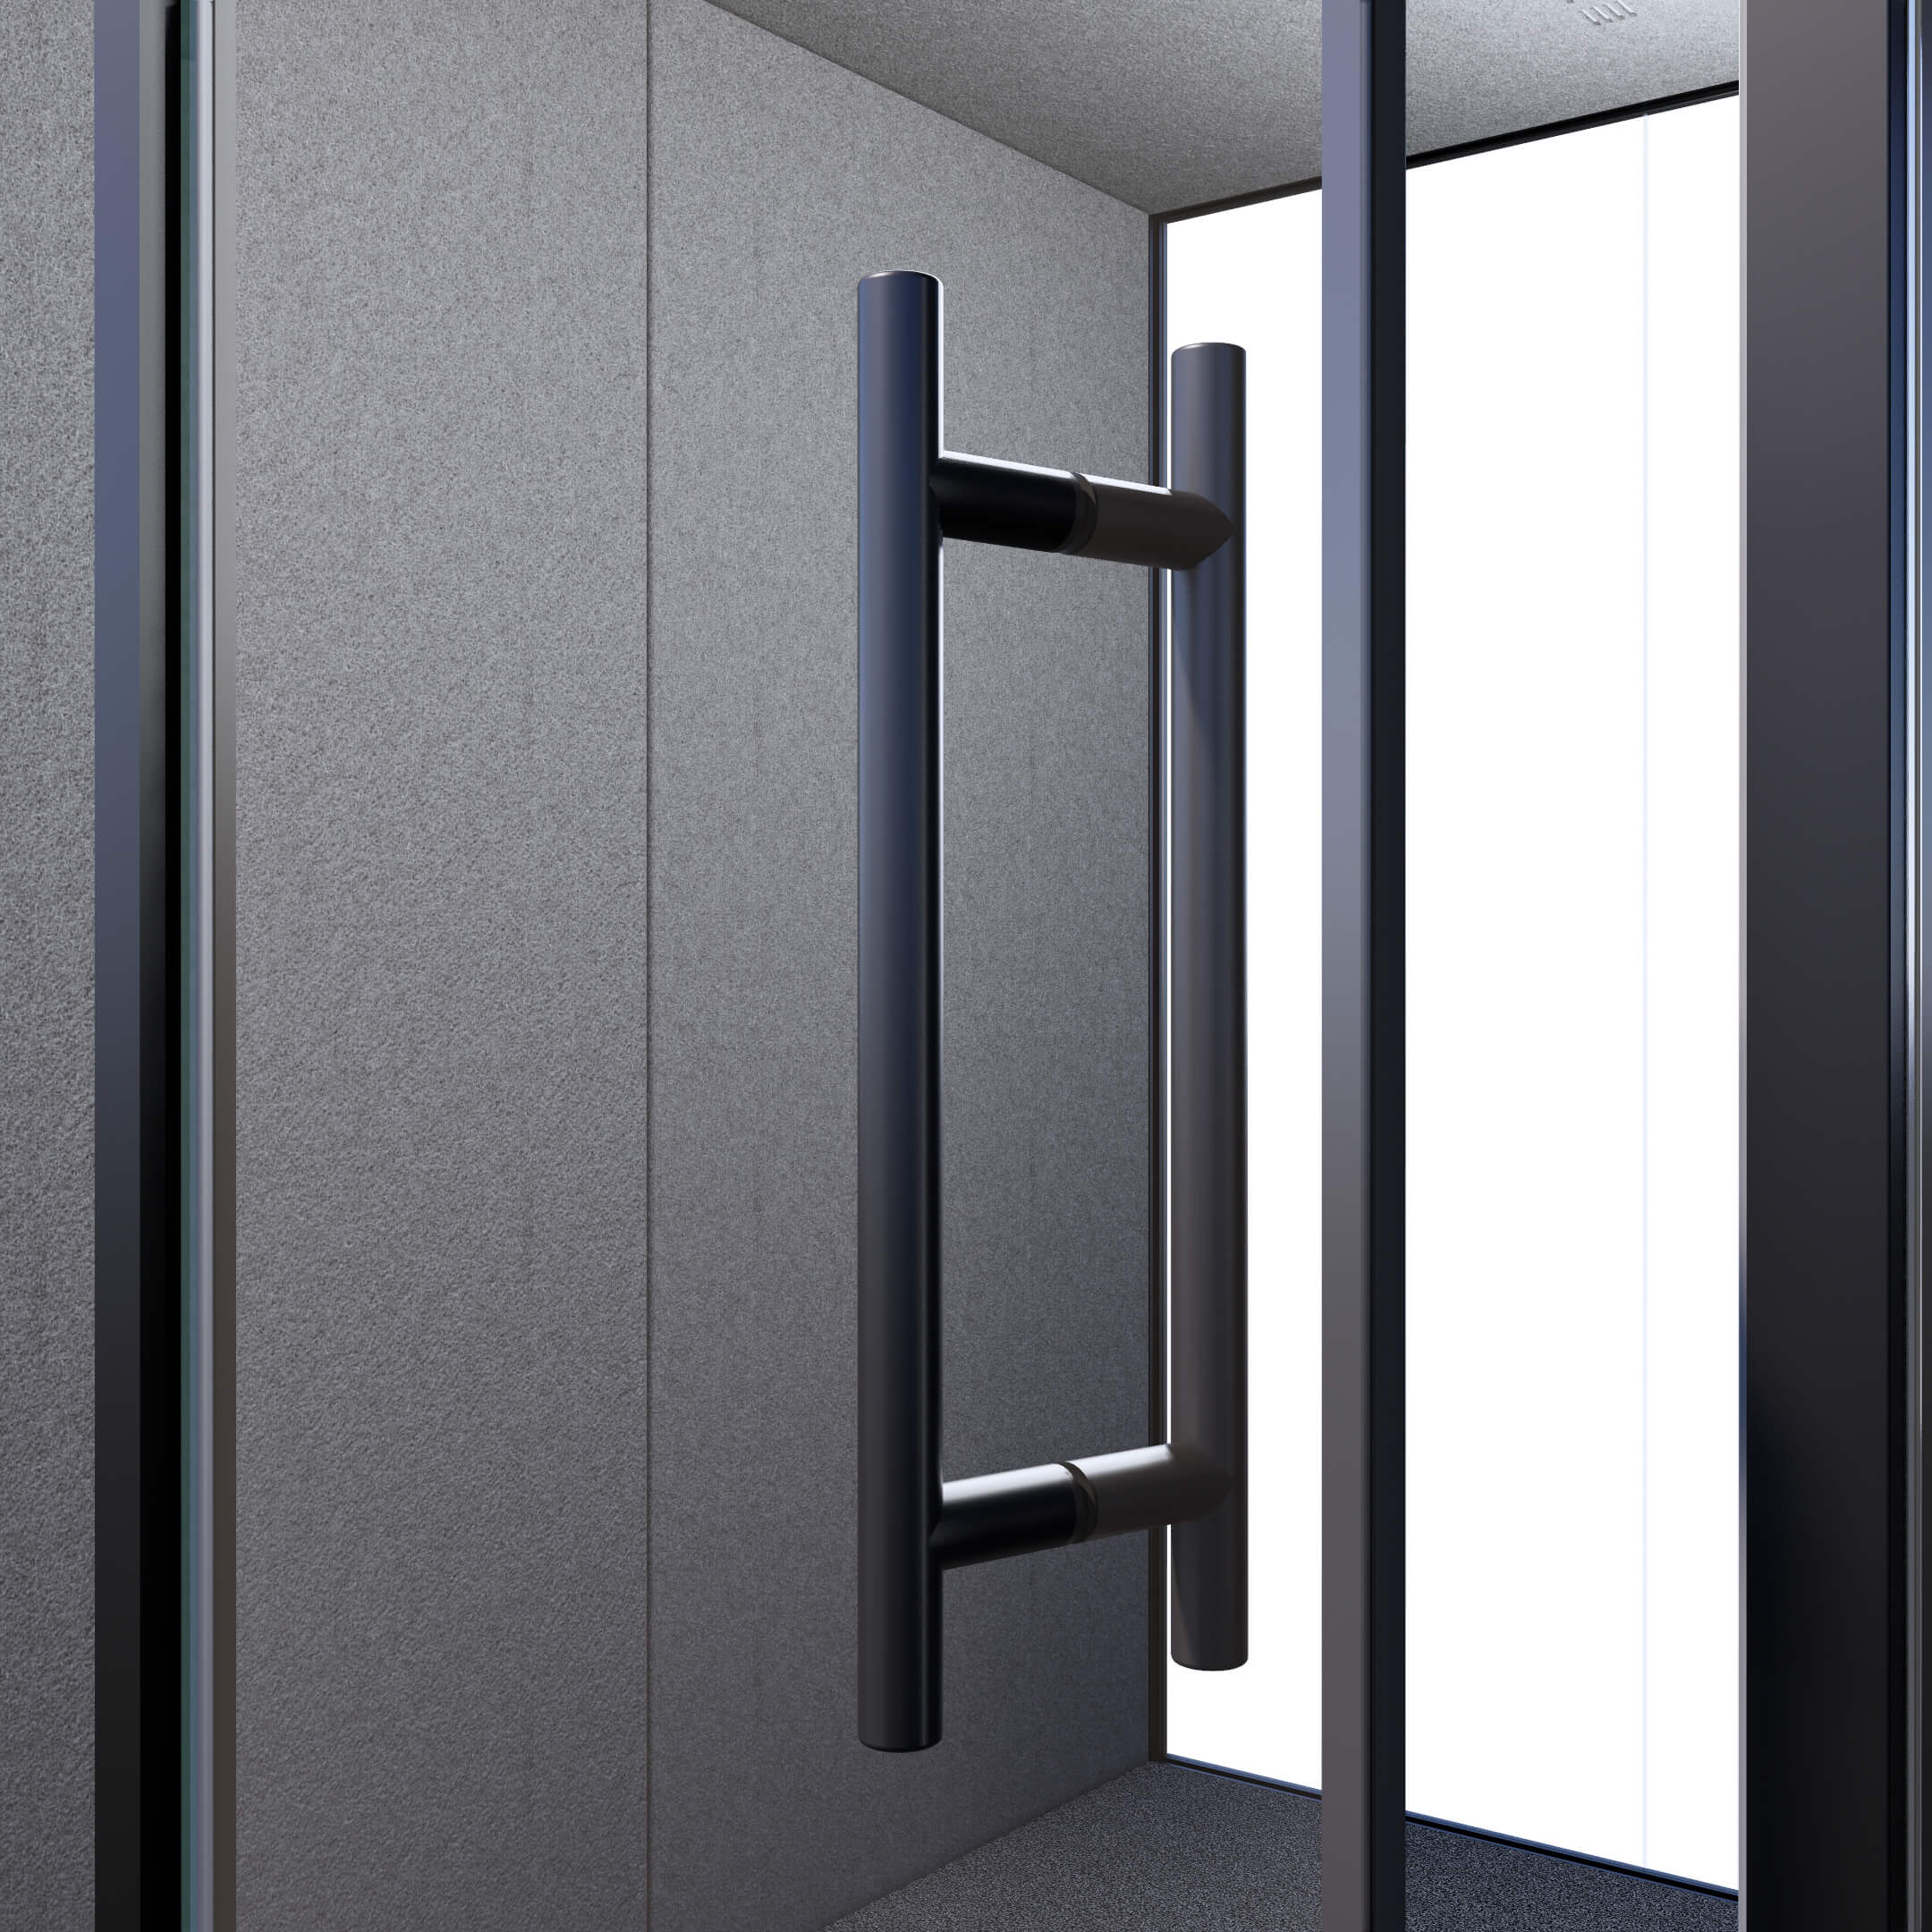 CHATBOX QUATTRO-DOOR HANDLE